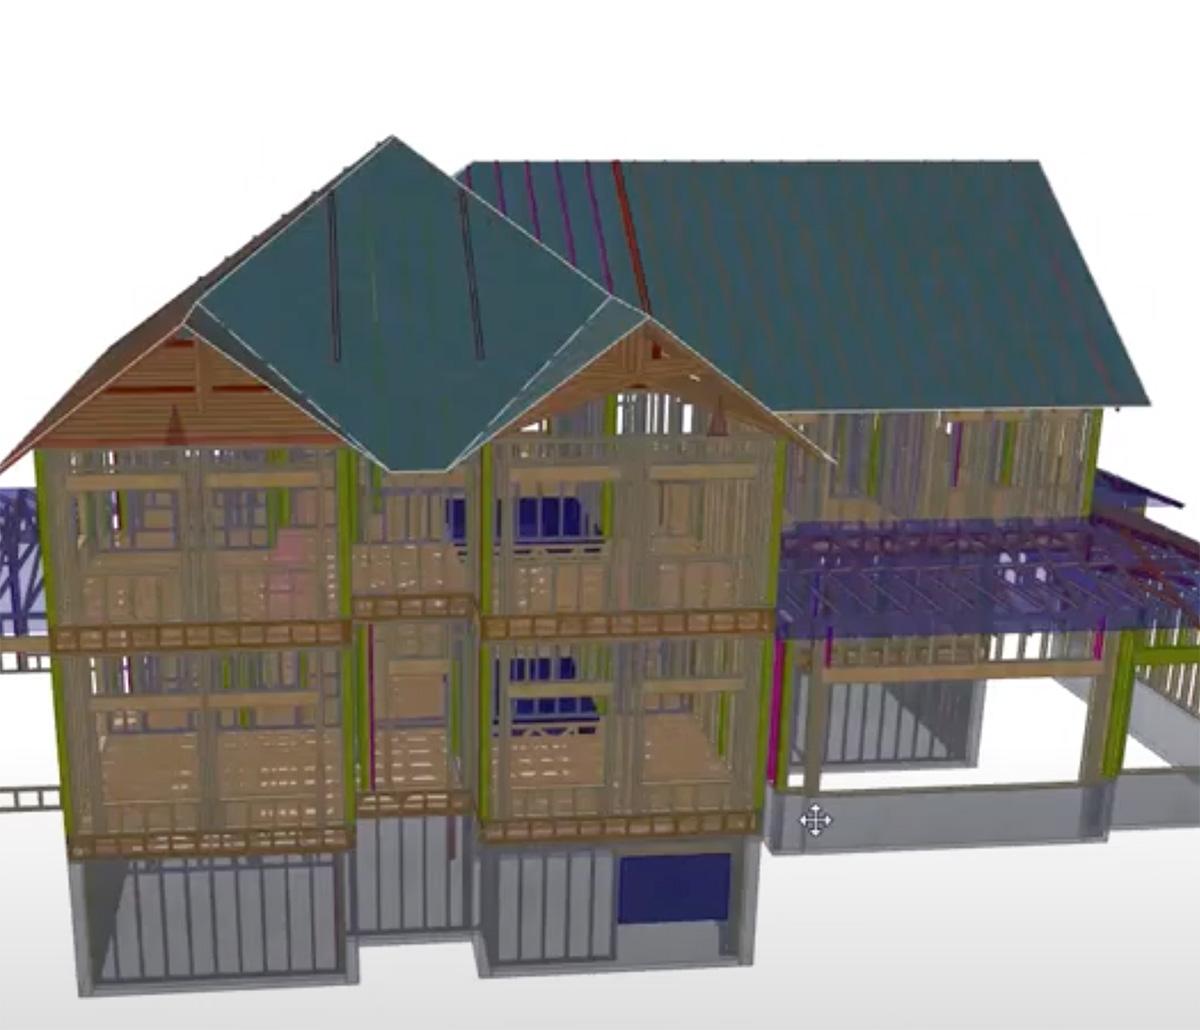 MiTek BIM Services - 3D BIM model of a house